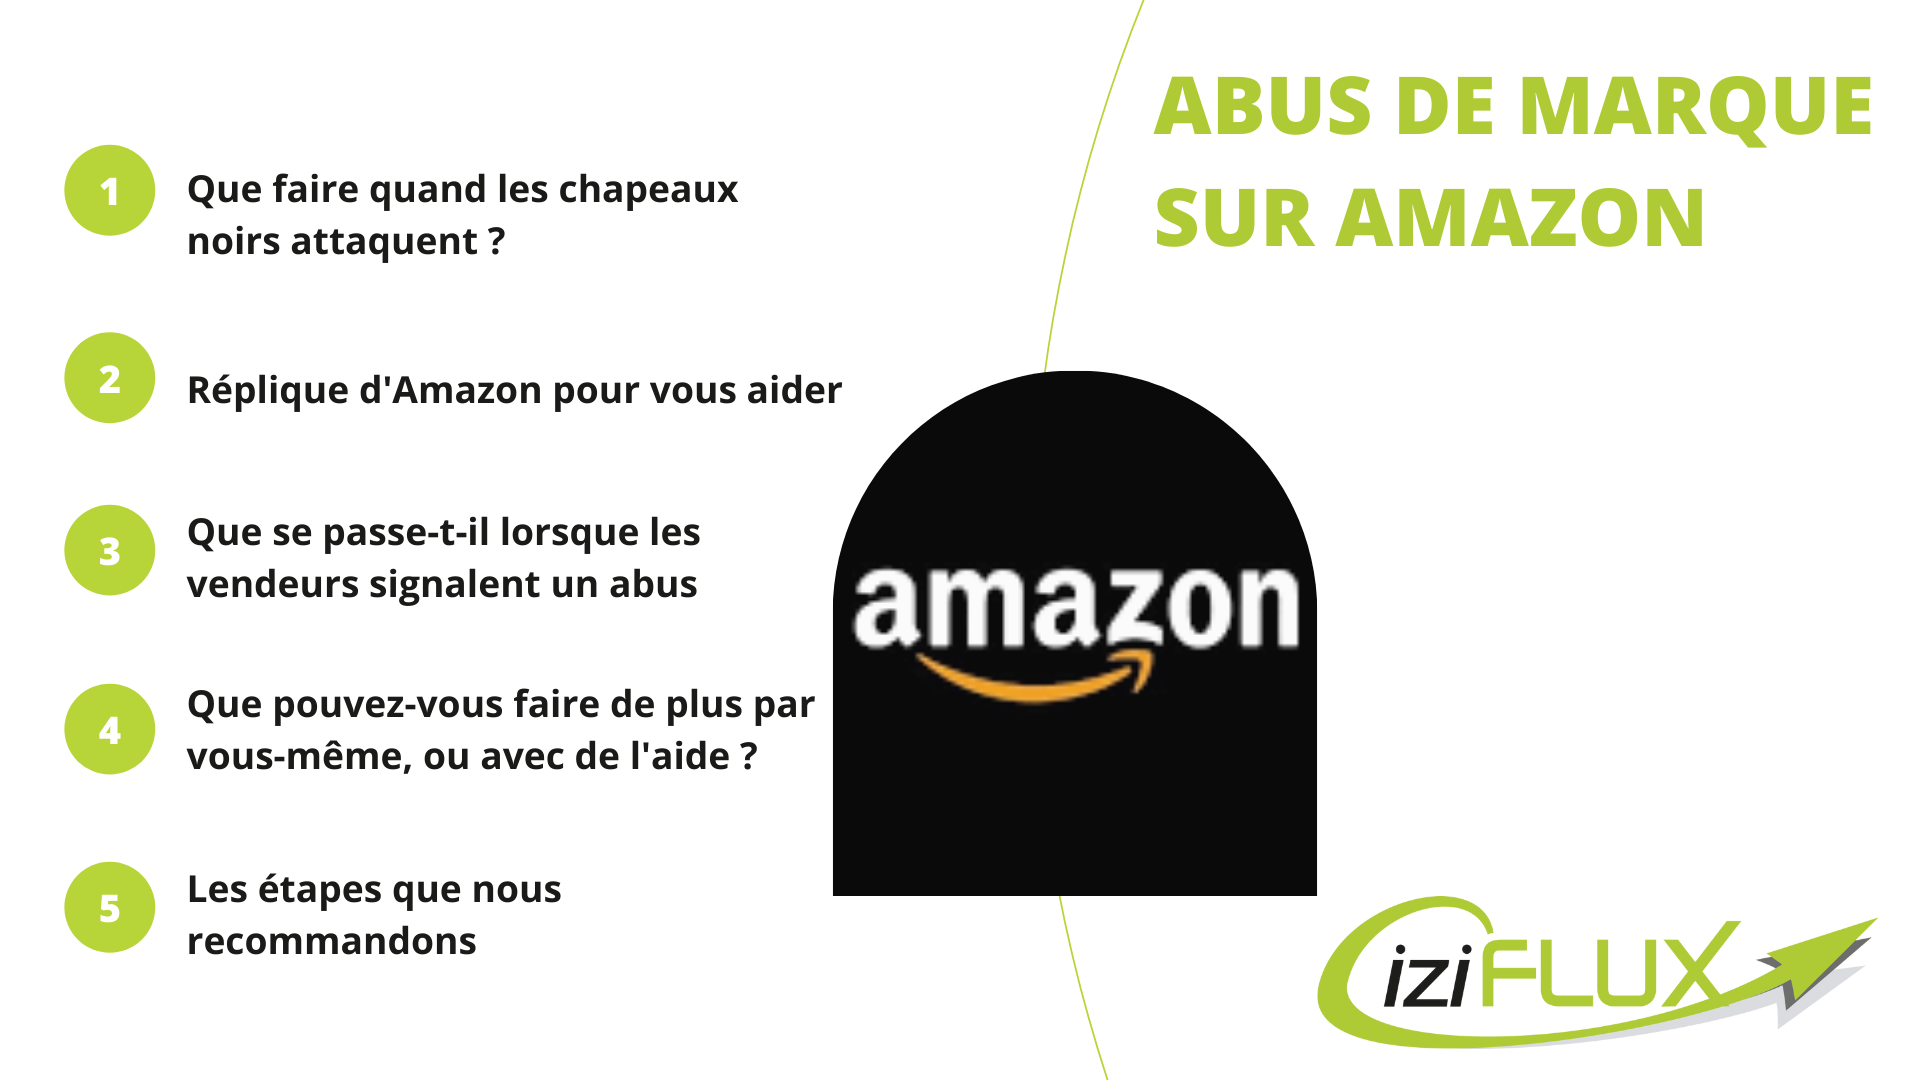 Articles Abus de marque sur Amazon